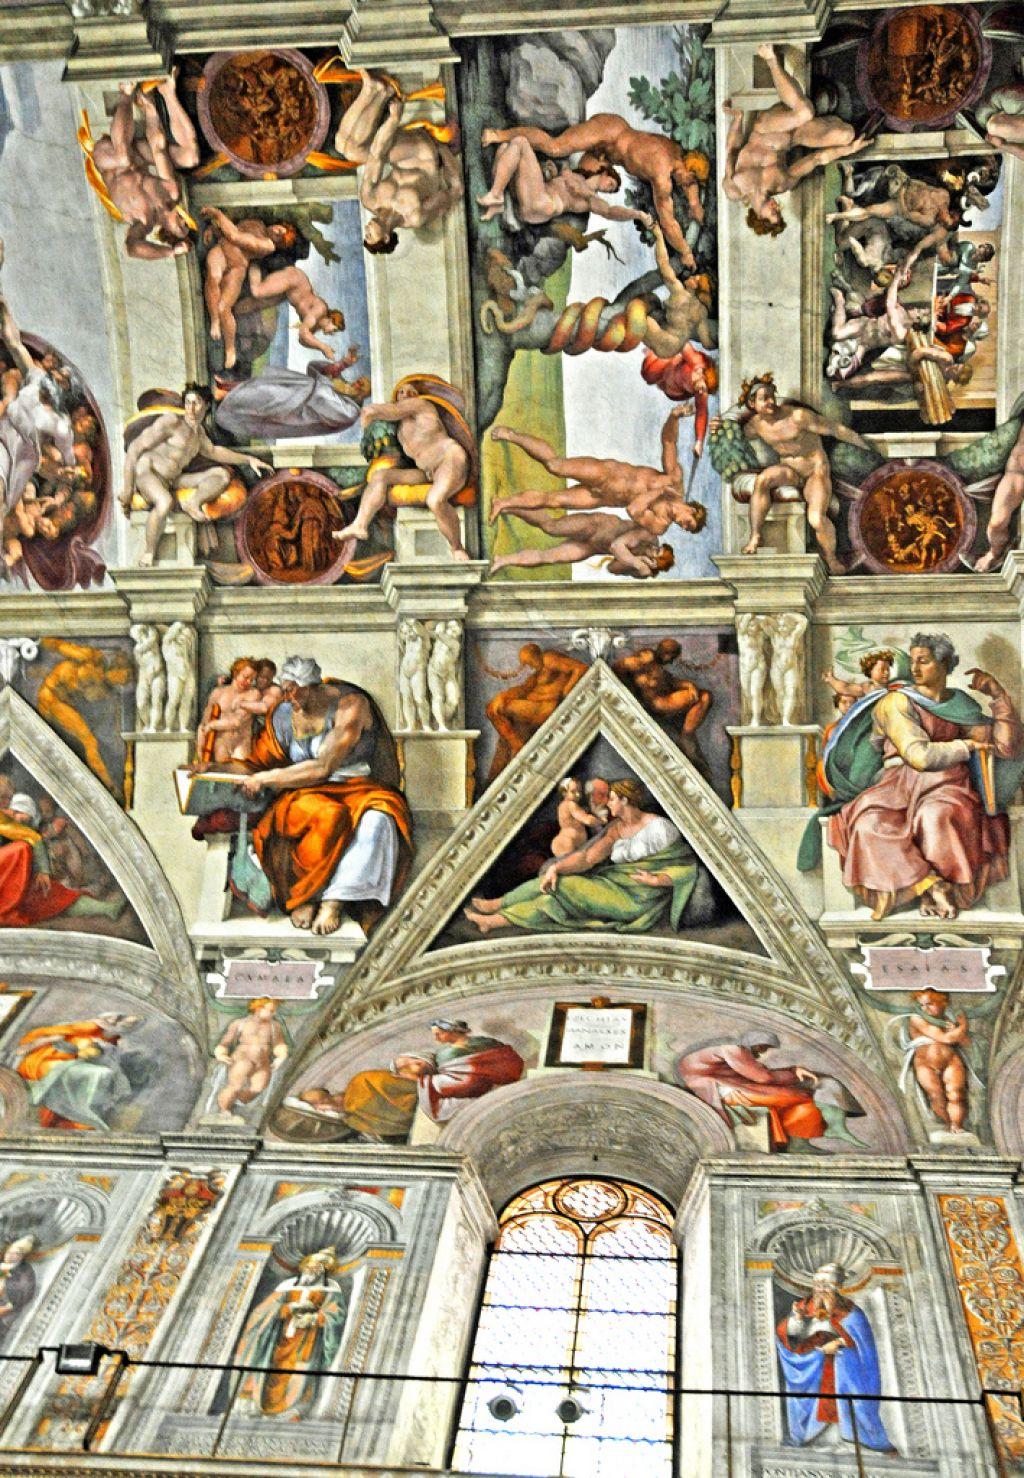 sistine chapel4 Inside the Sistine Chapel